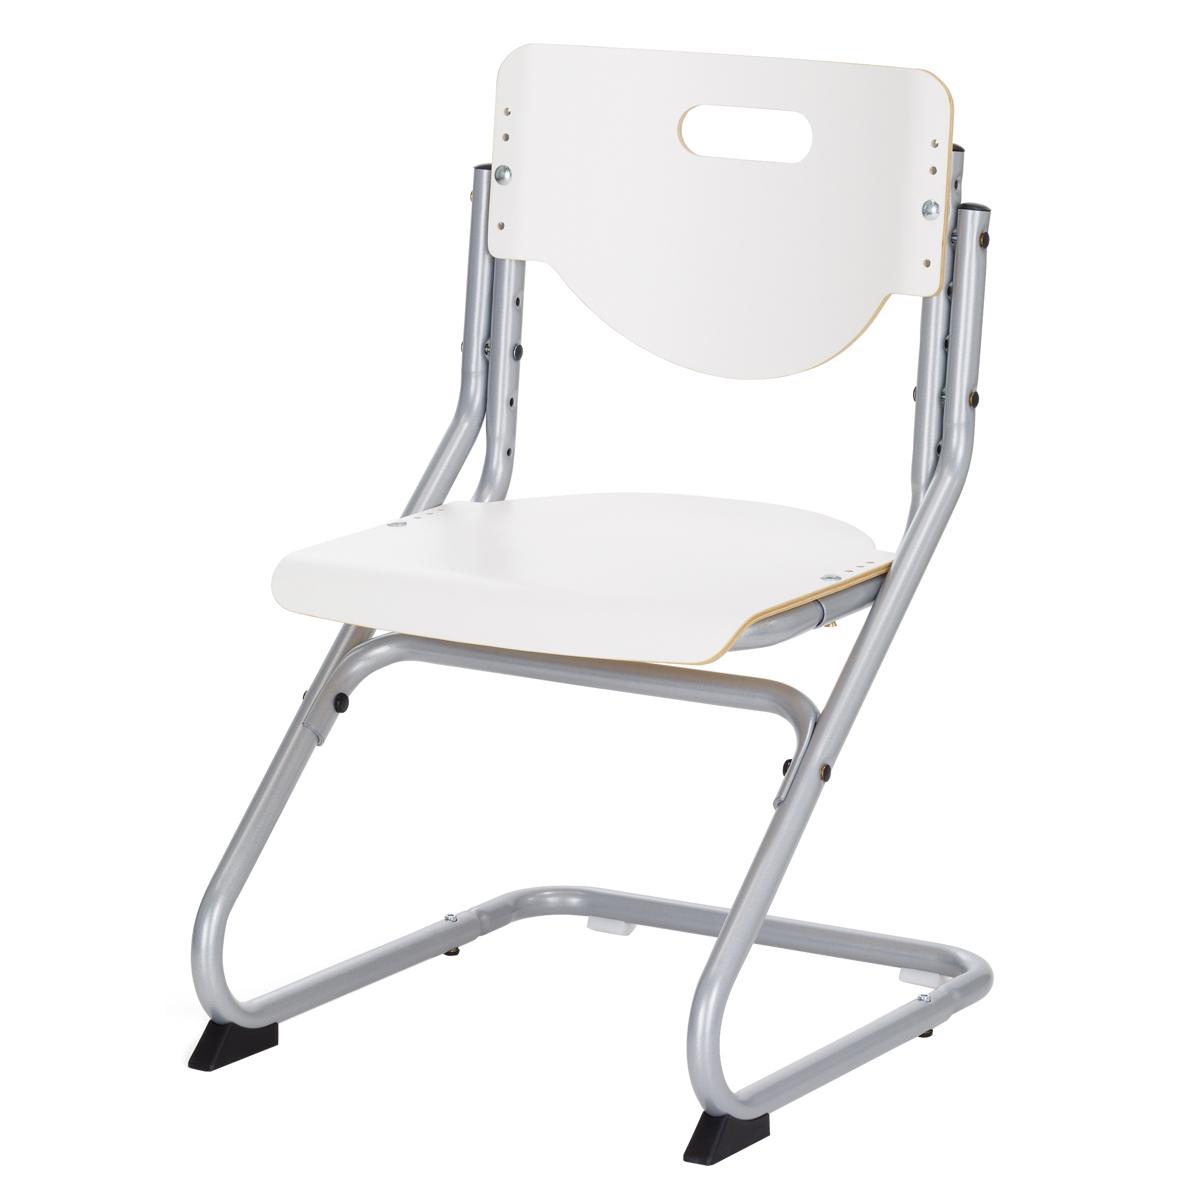 KETTLER krzesło CHAIR PLUS WHITE